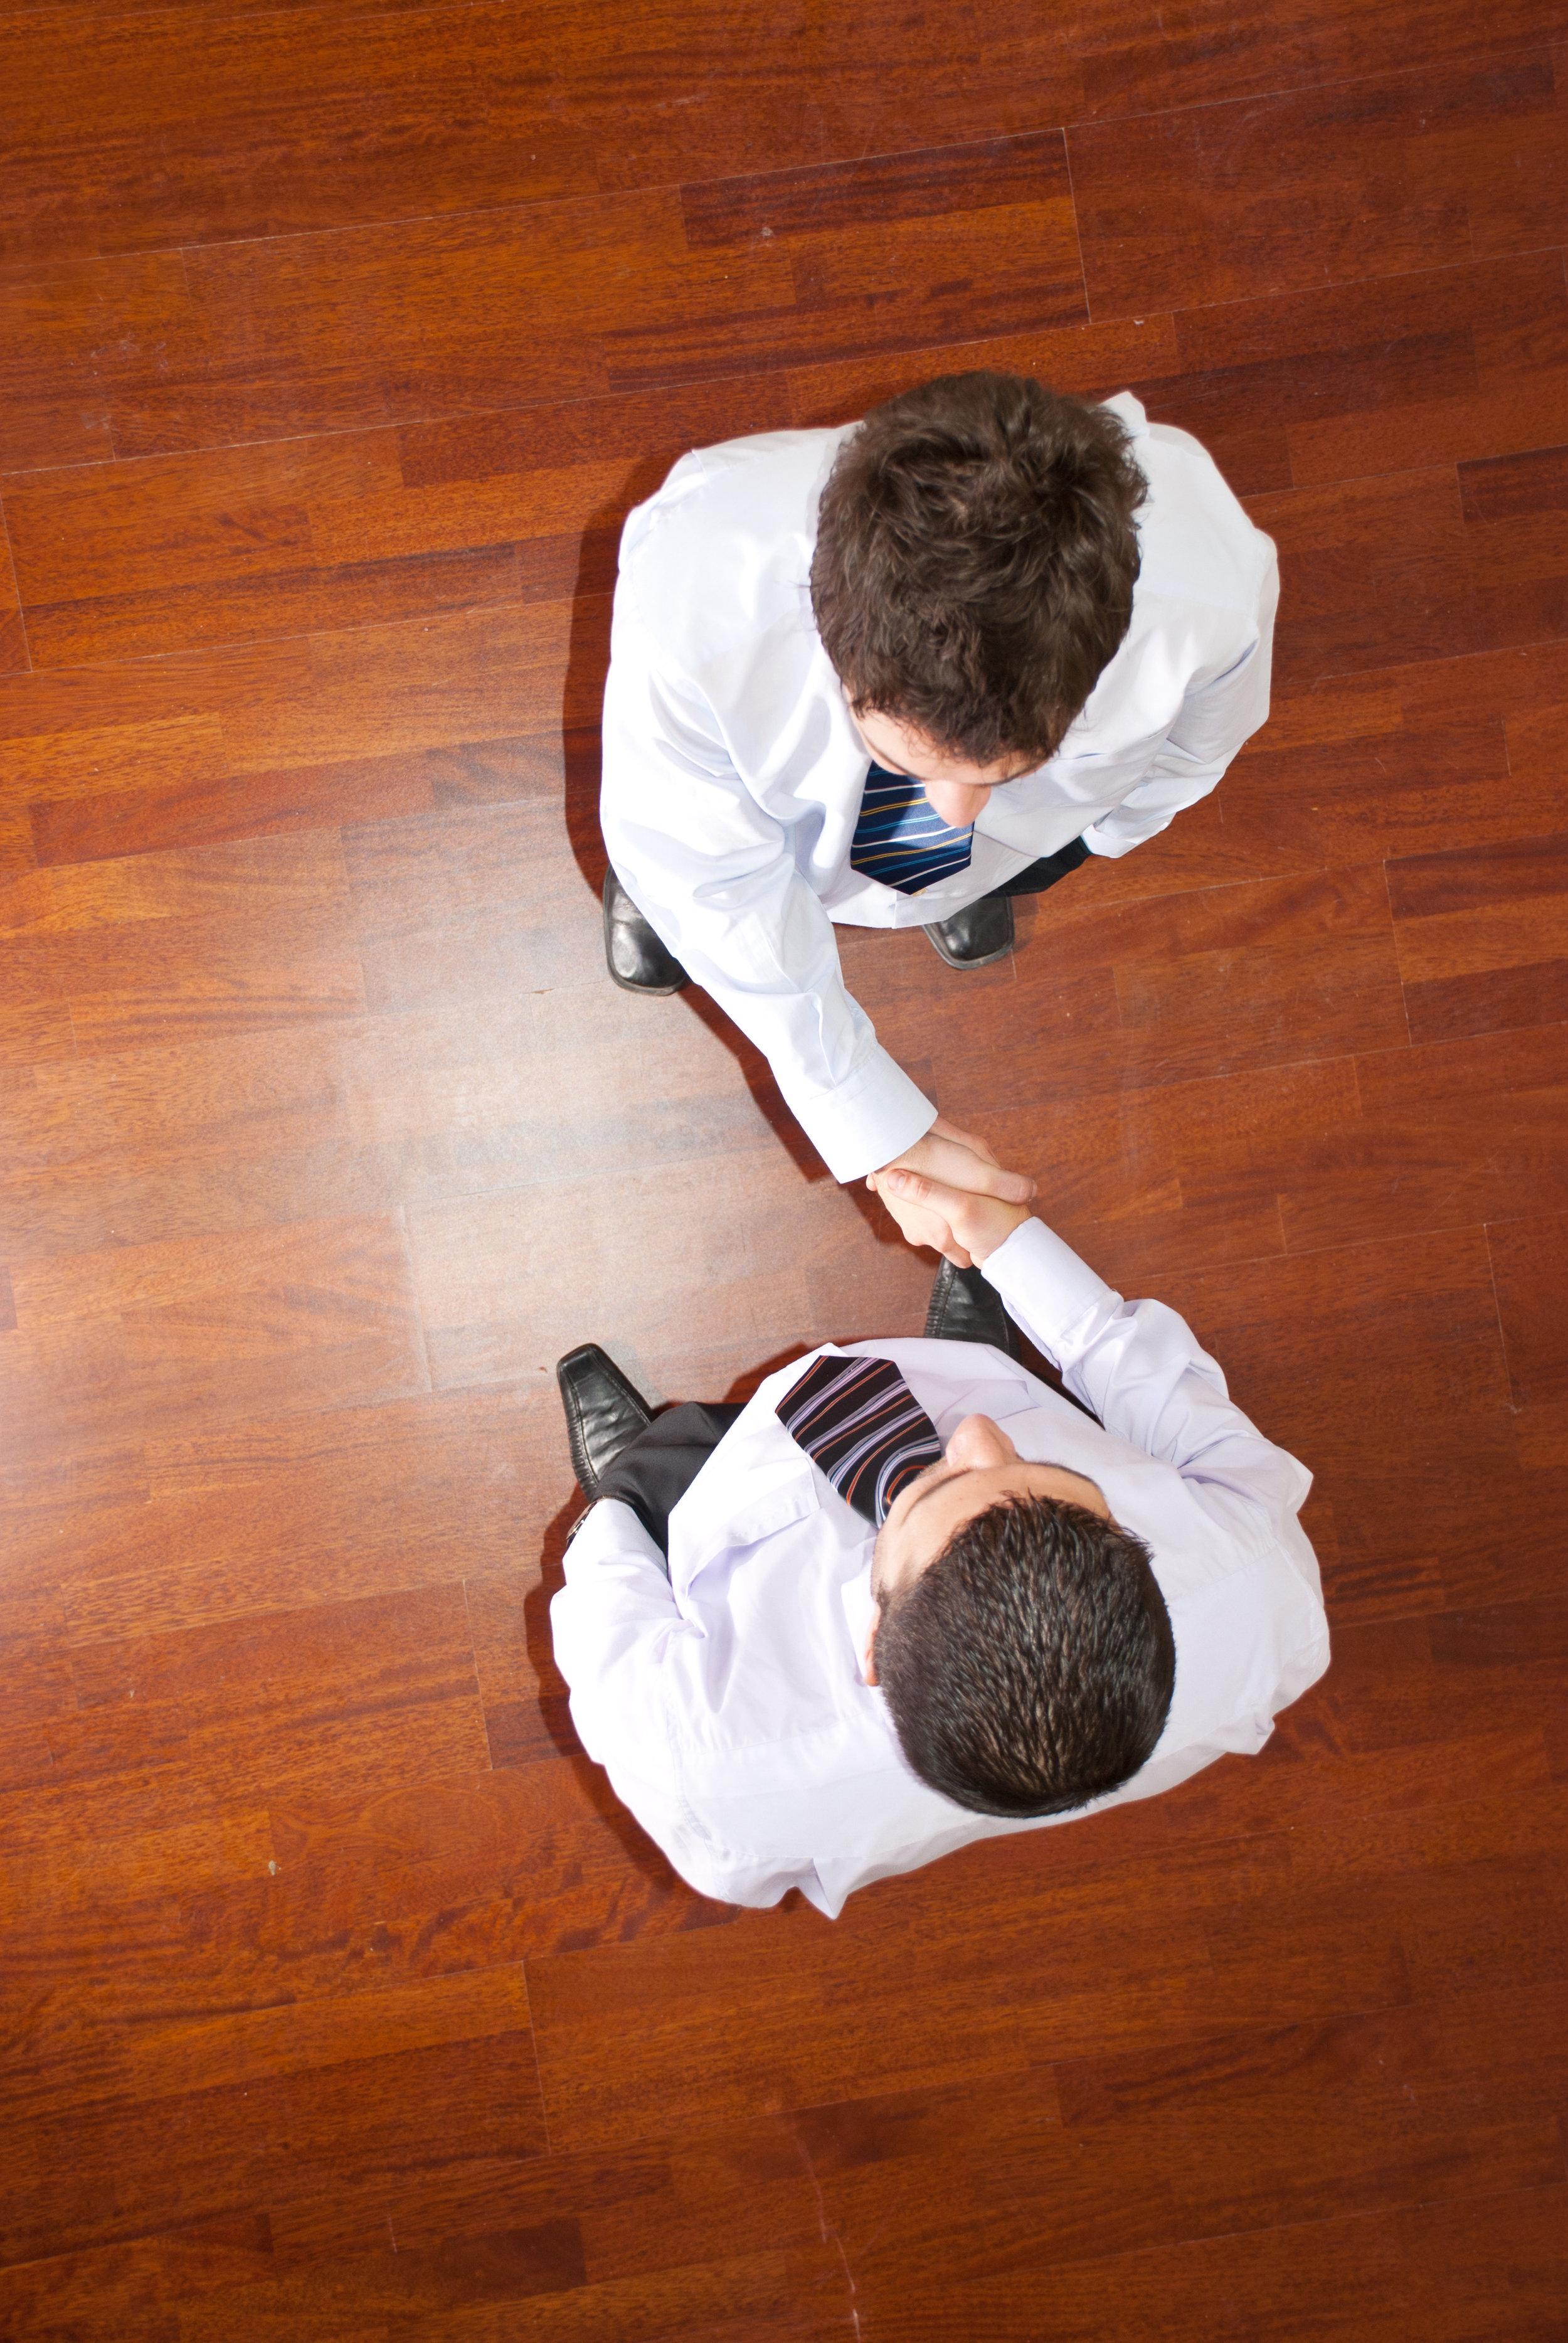 AdobeStock_30143254 handshake above.jpeg